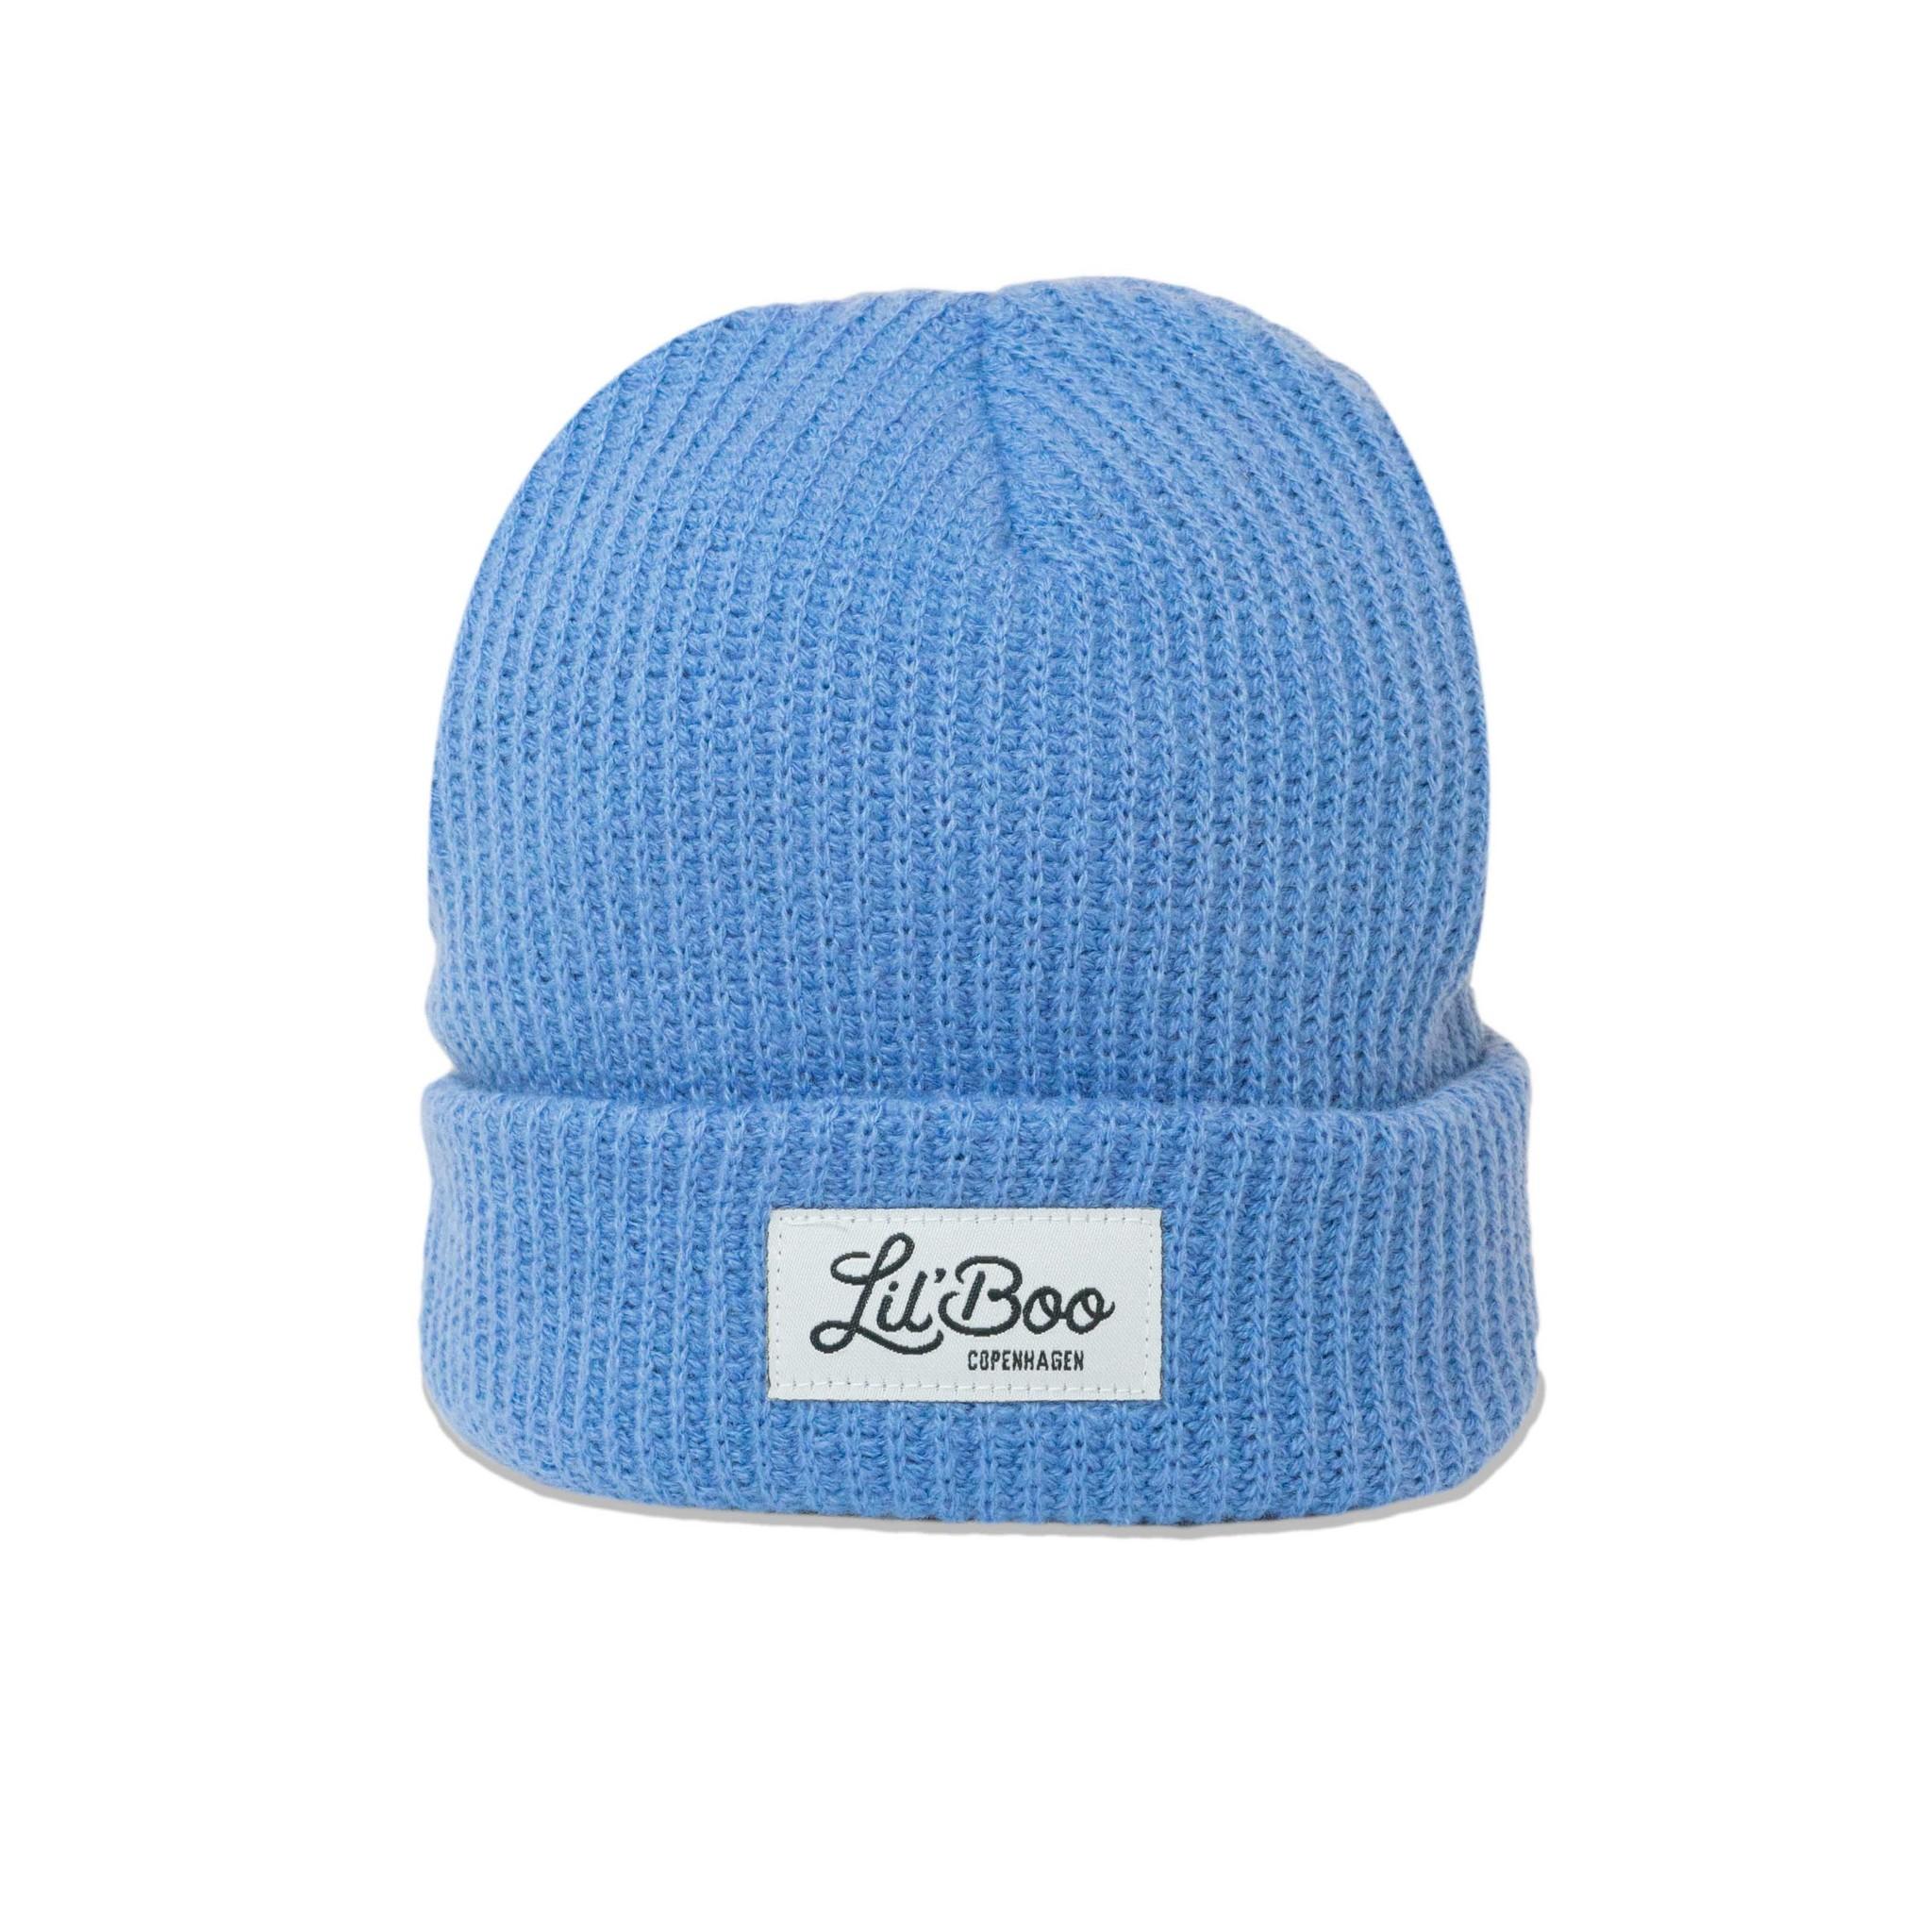 Beanie - Light Blue-1